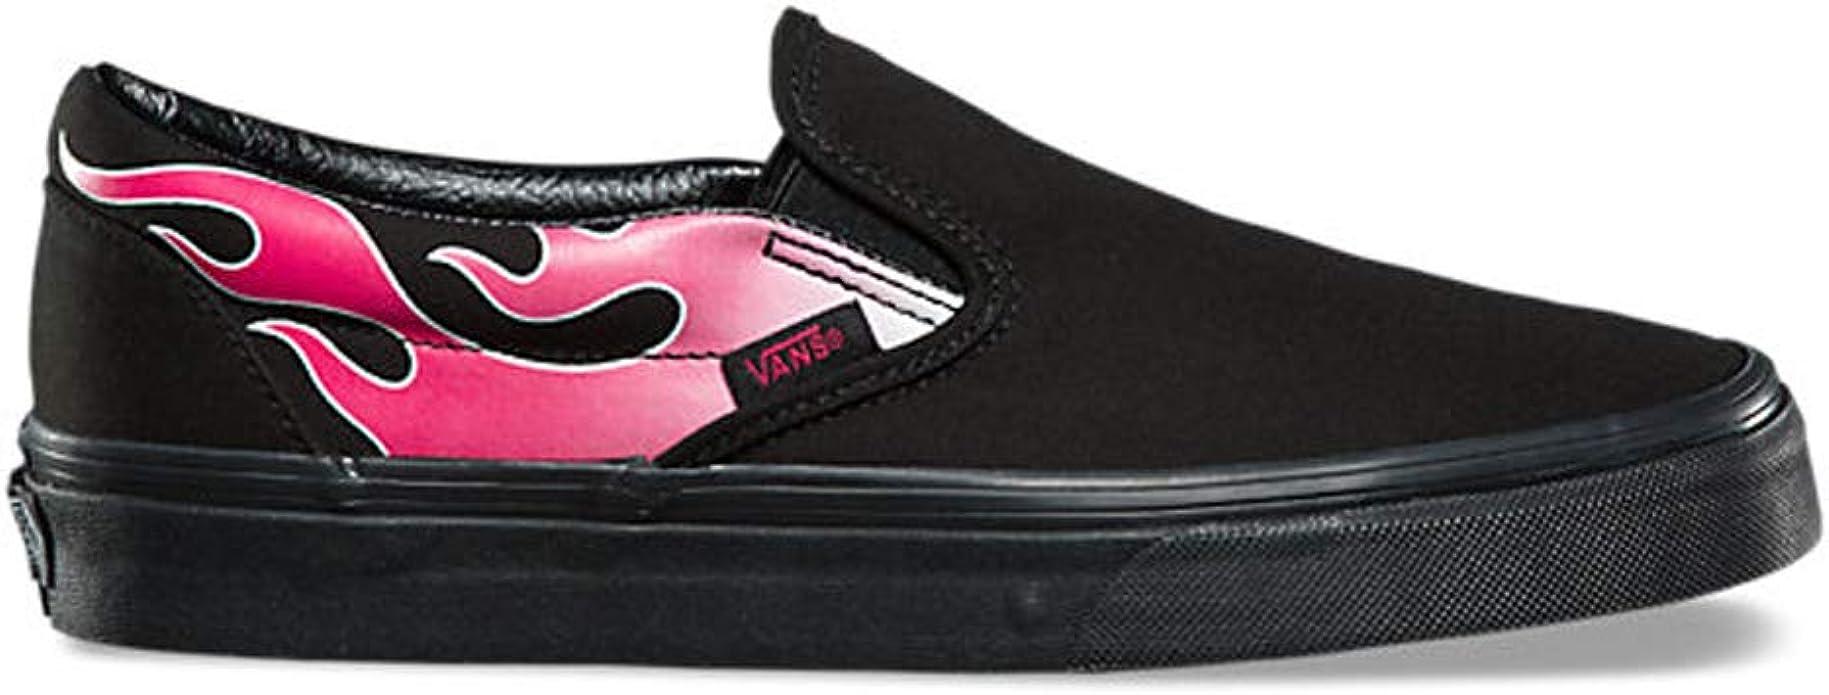 Vans Classic Slip-On (Flame) Black/Pink